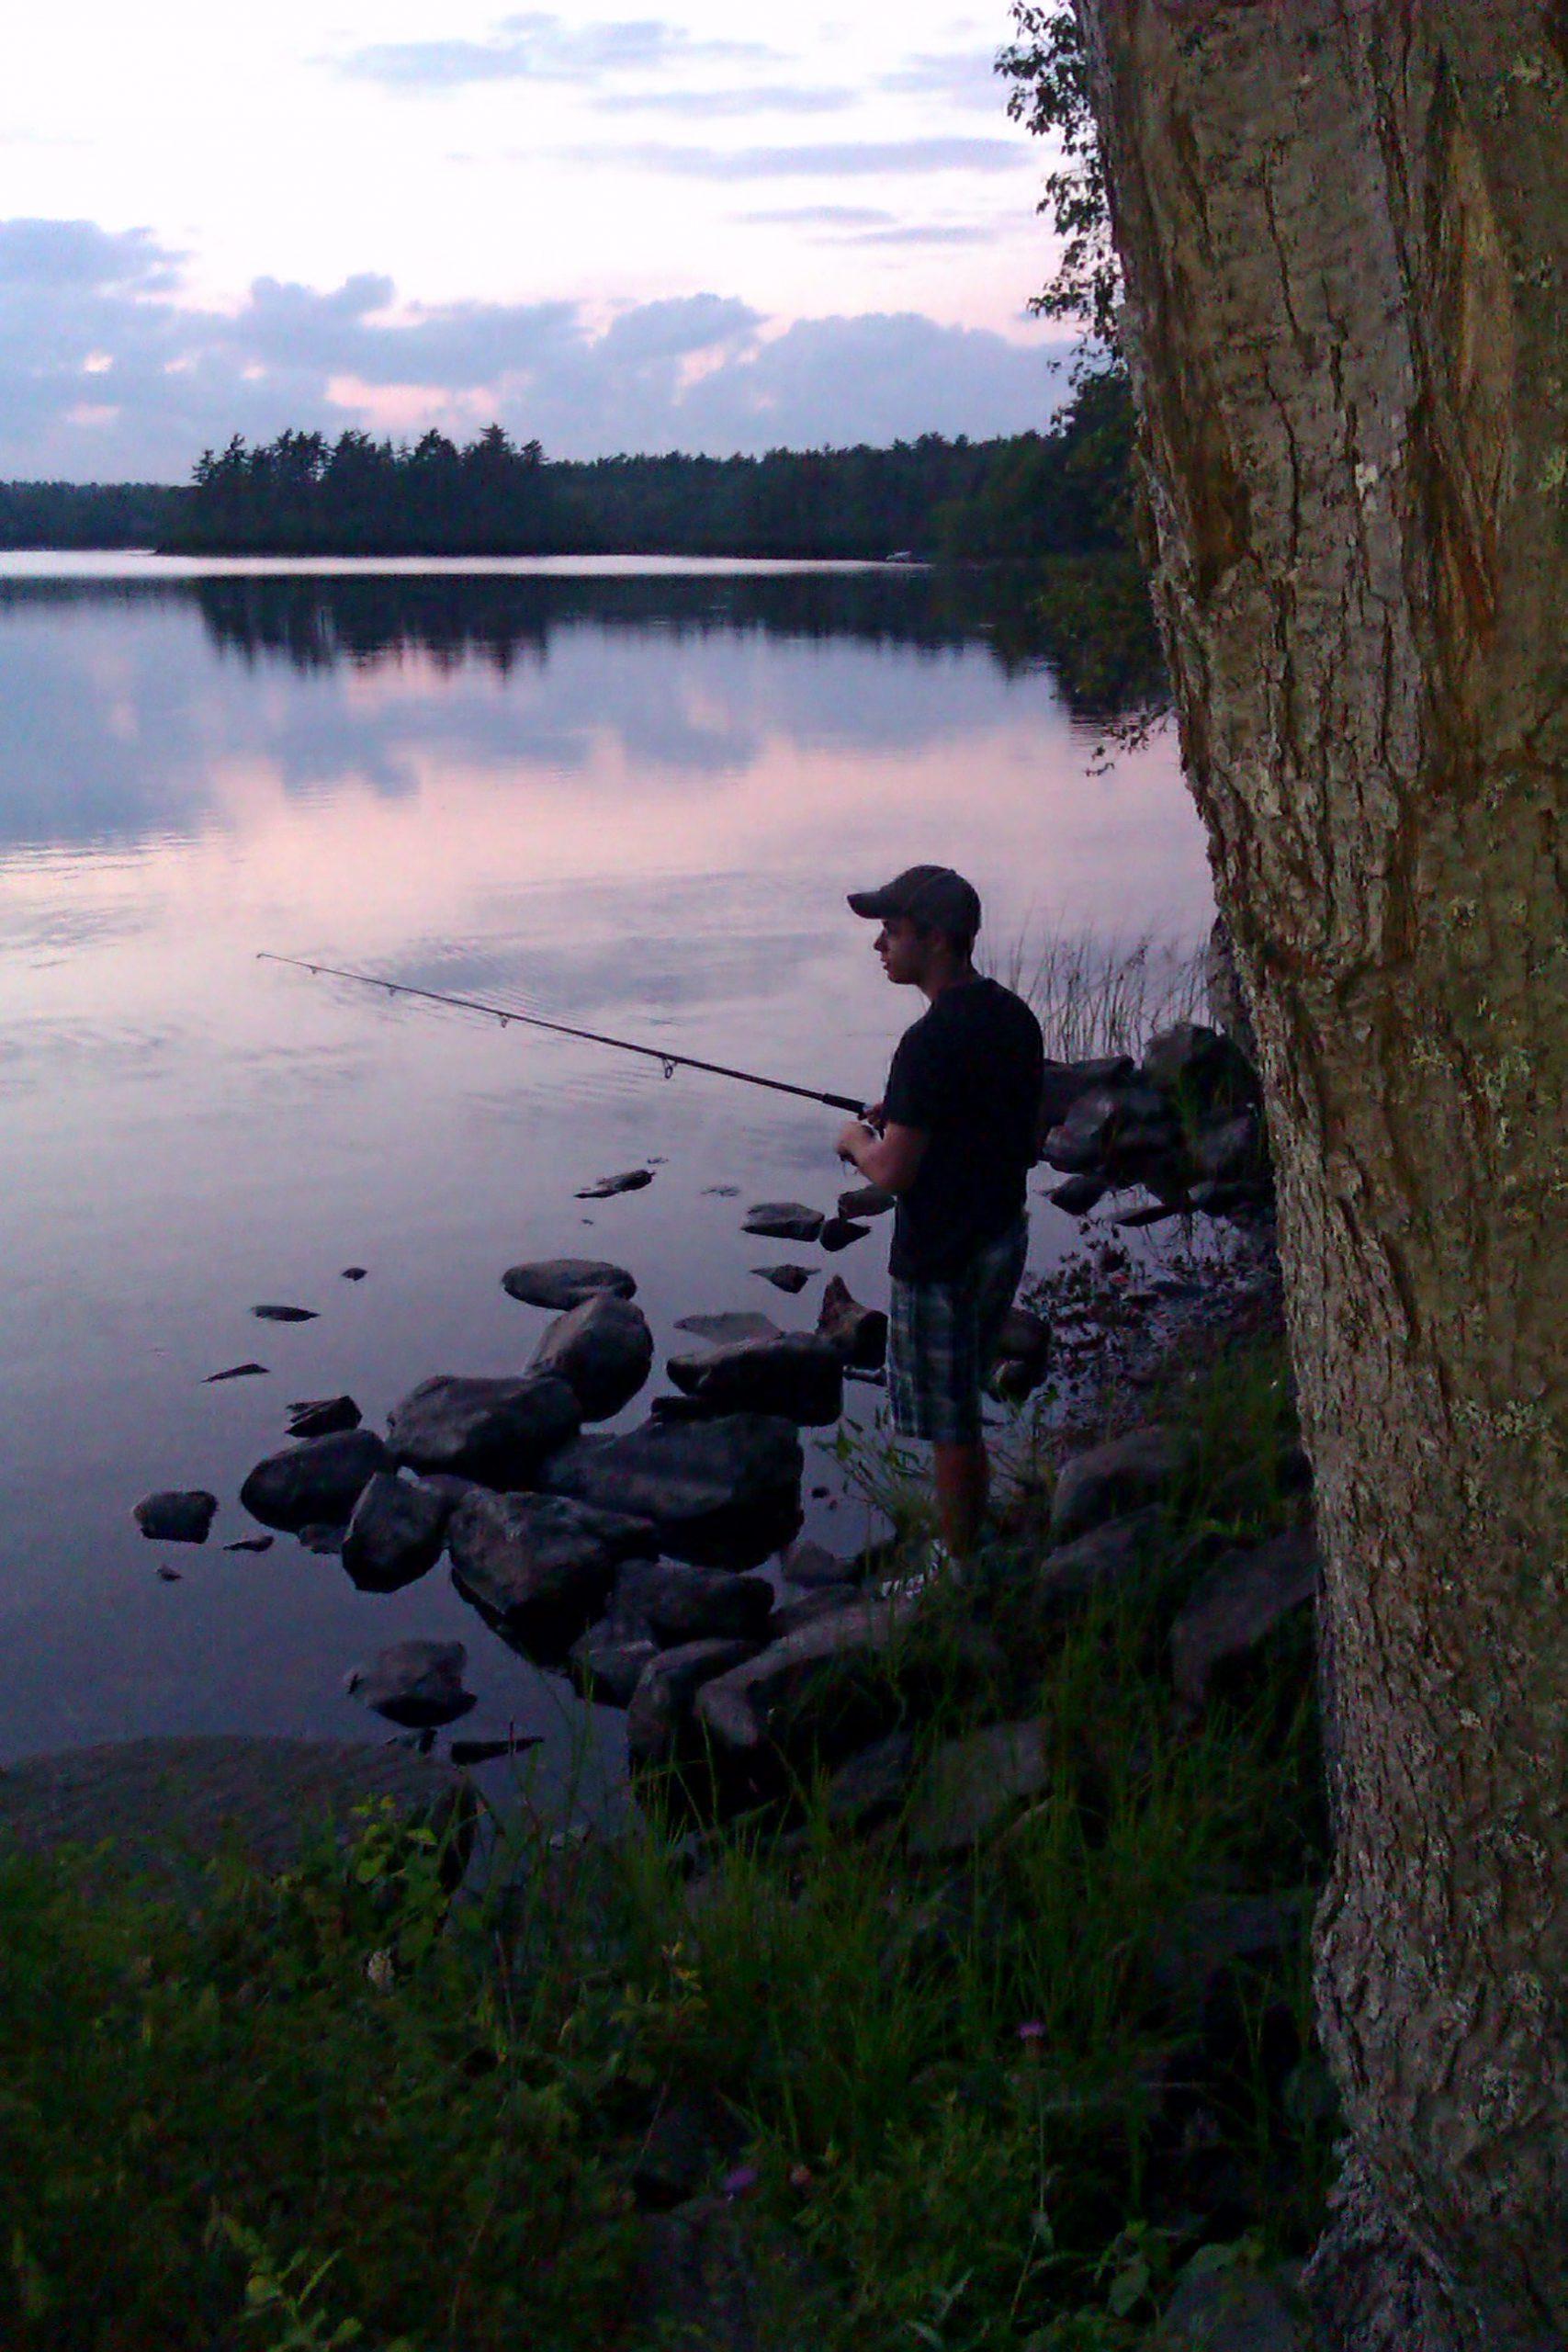 James Jabalee fishing